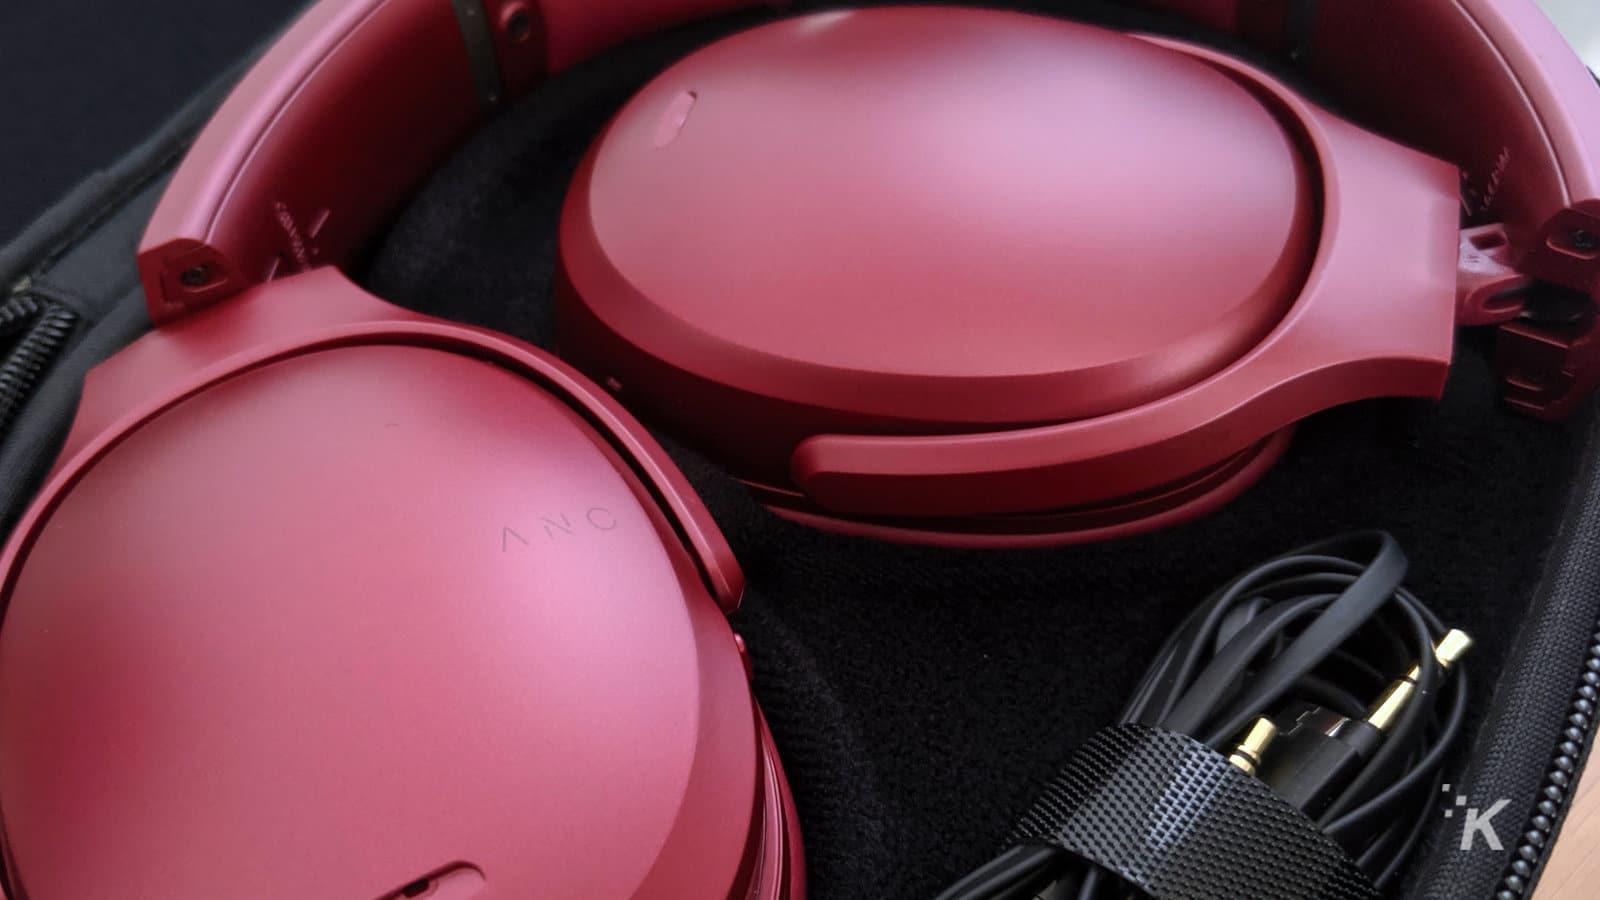 skullcandy crusher anc headphones